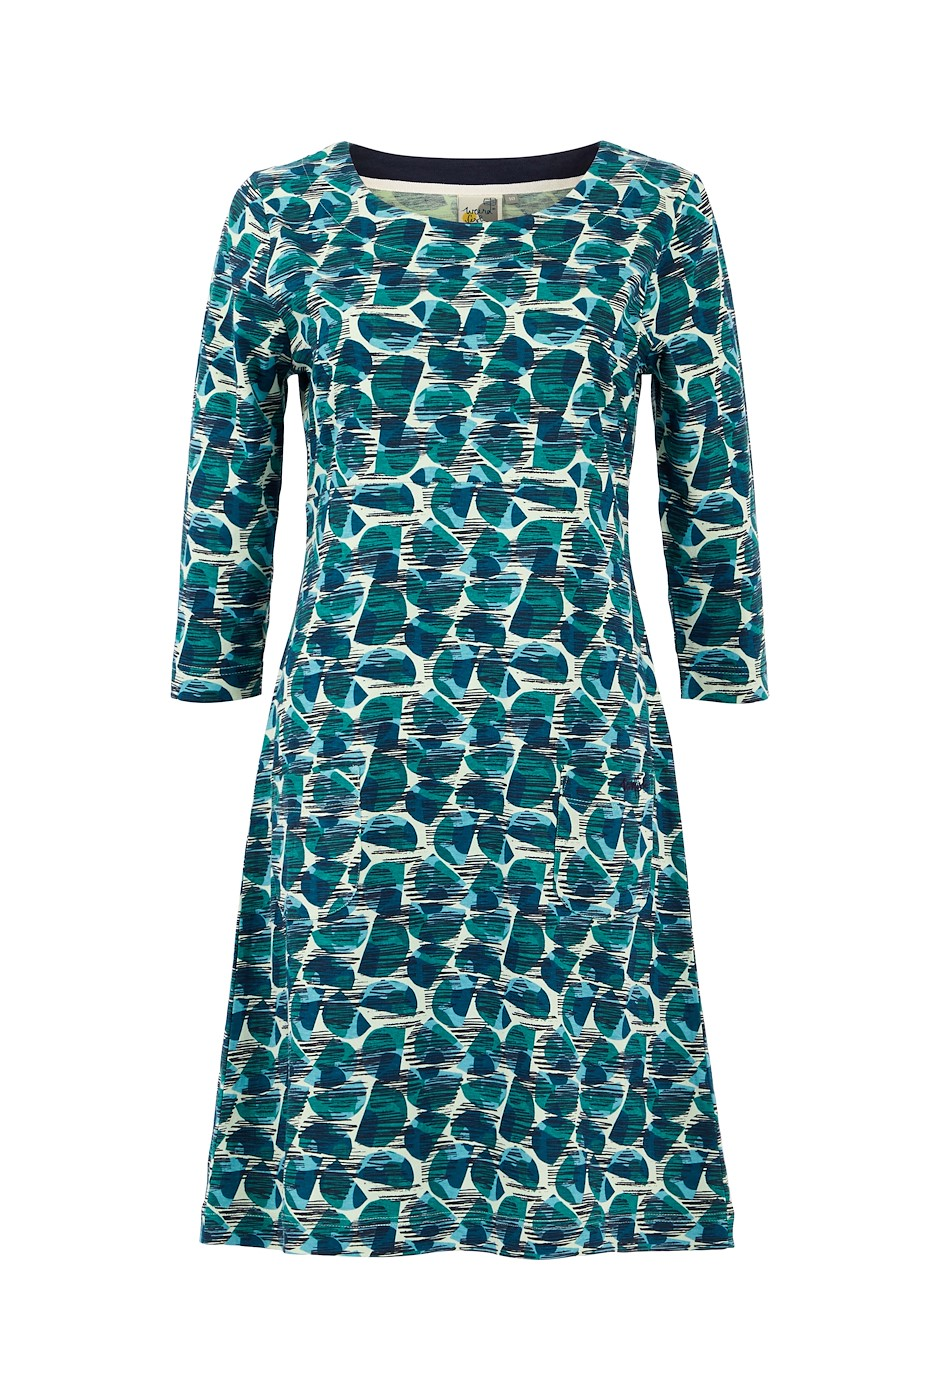 Starshine Organic Cotton Printed Jersey Dress Bottle Green